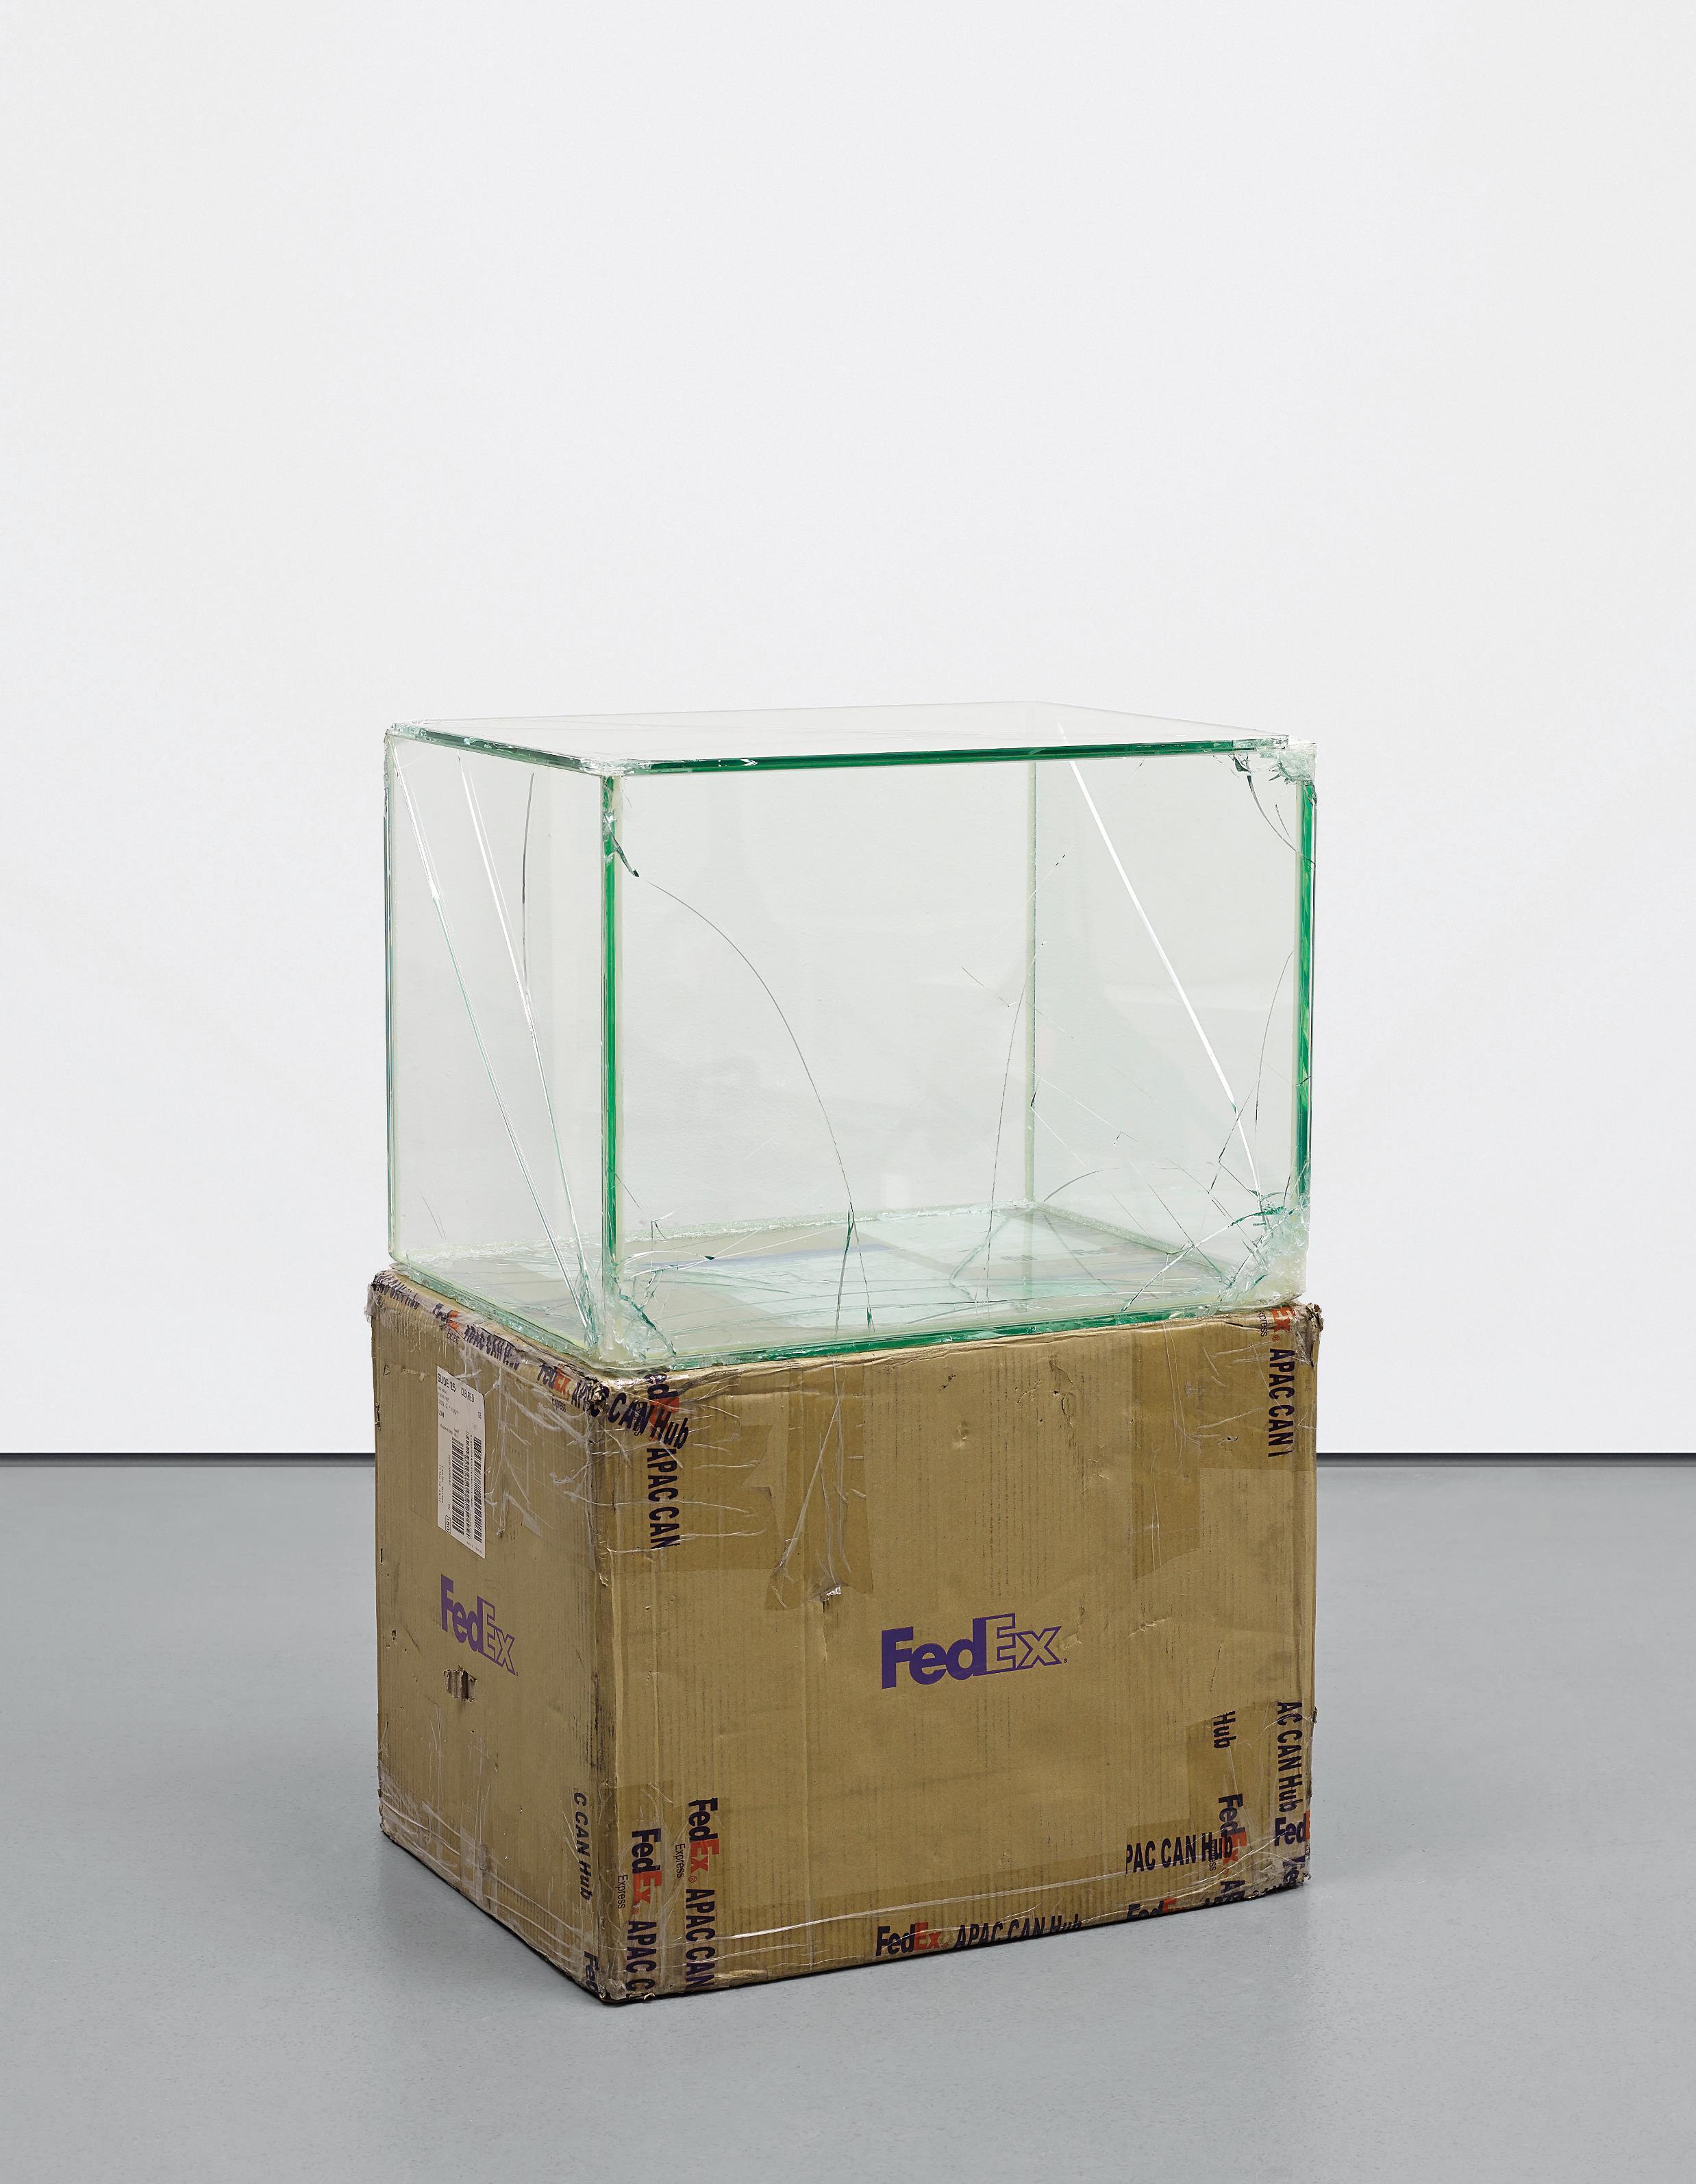 Walead Beshty-Fedex Large Kraft Box 2004 Fedex 155143, #875468976062-2011